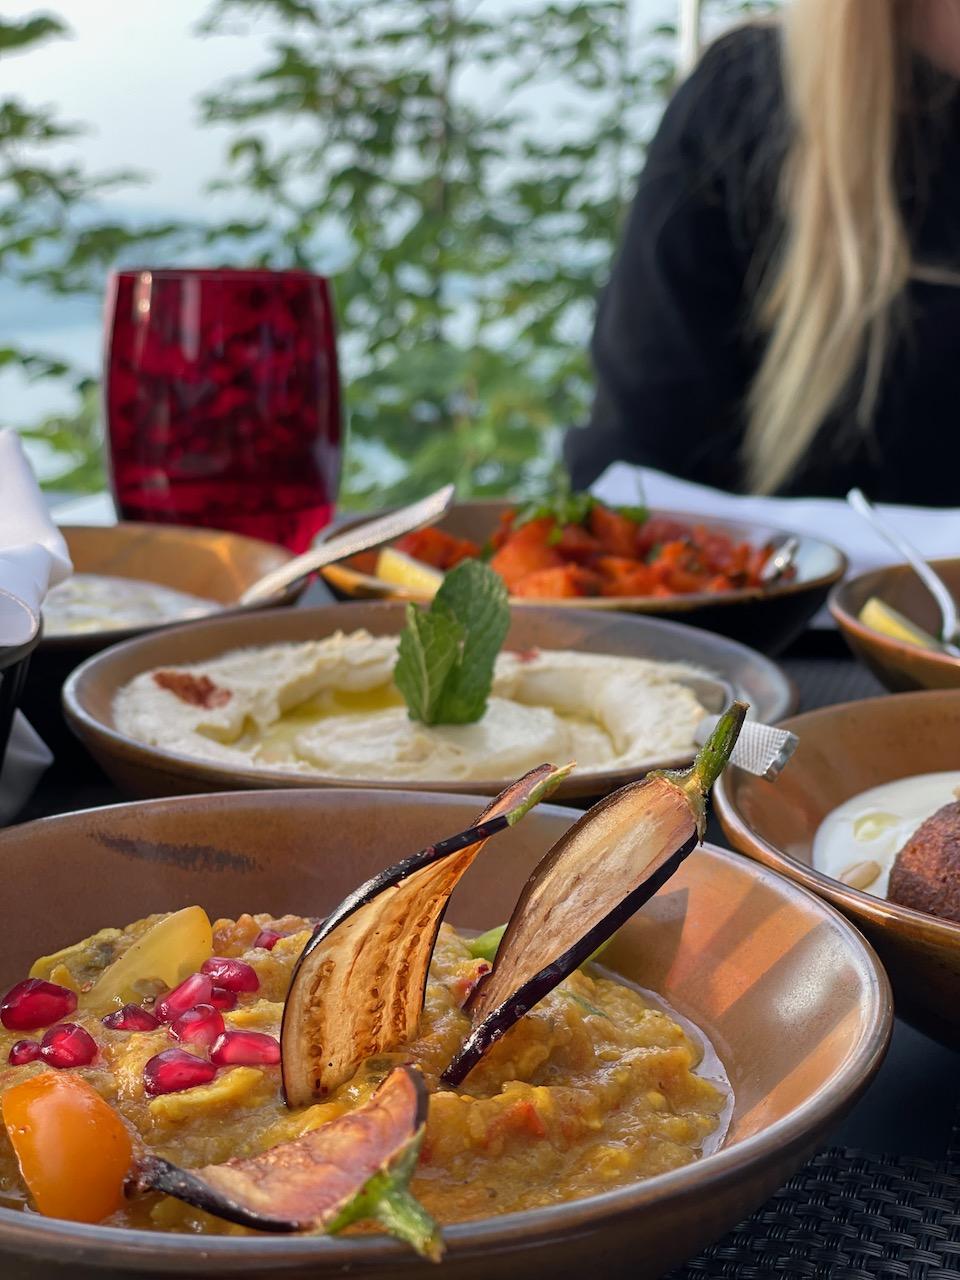 Sharq Restaurant